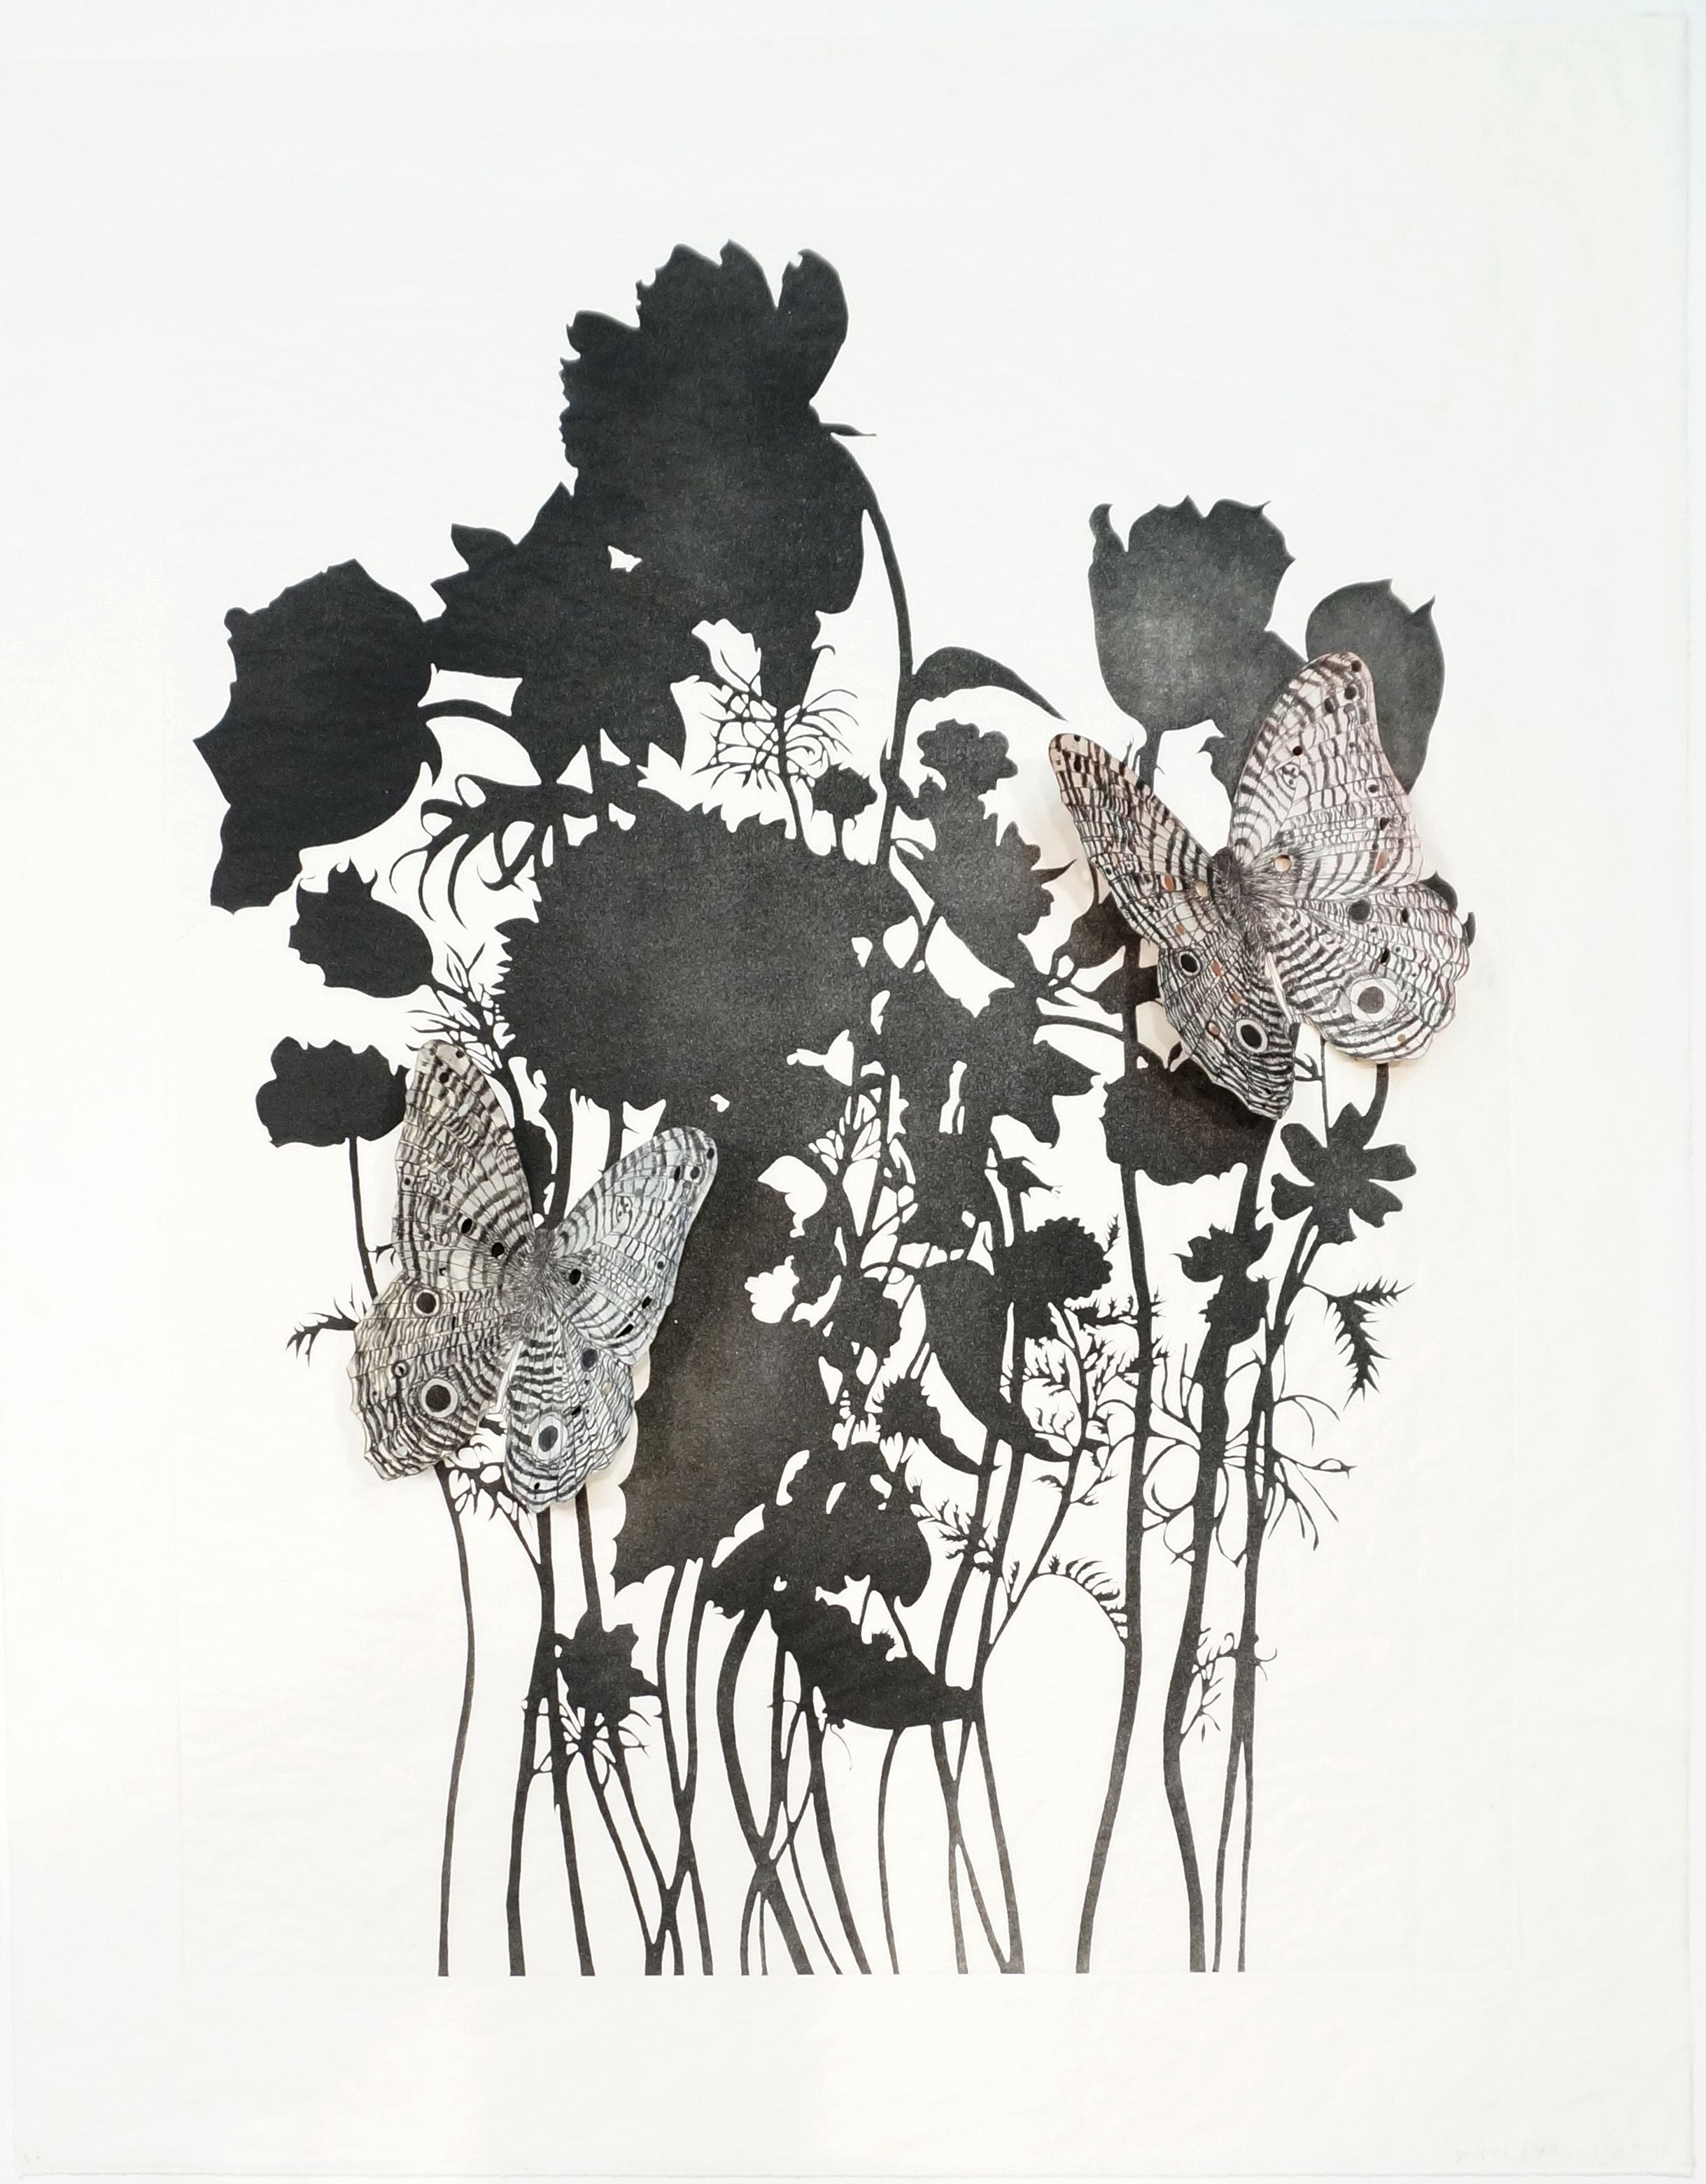 Valerie Hammond Flutter II, 2016 Intaglio on gampi with collage